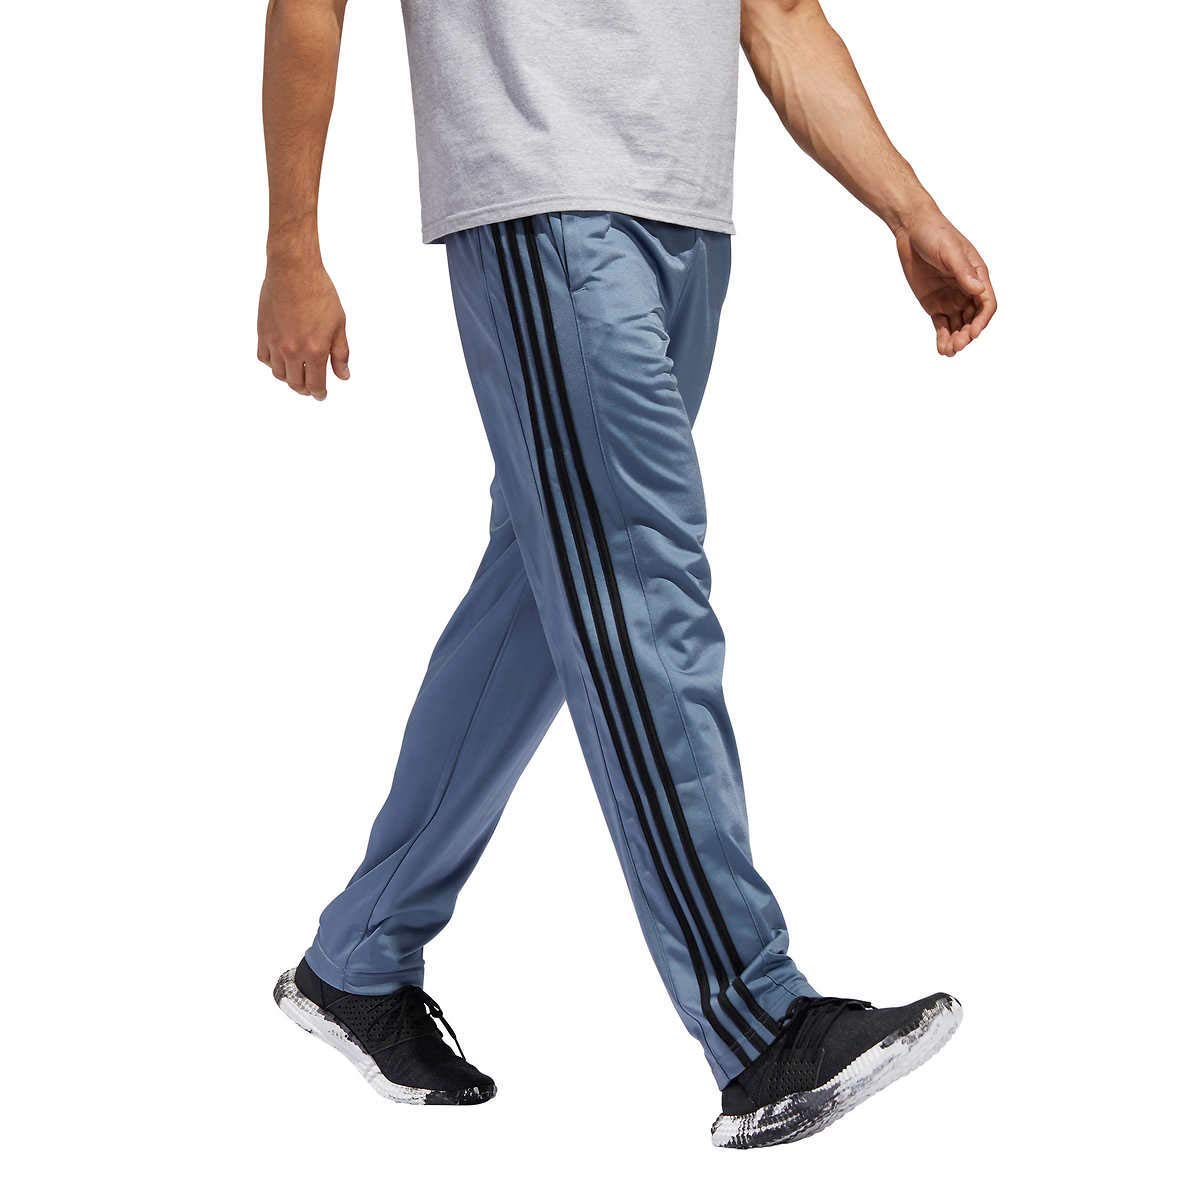 adidas Men's Essential Track Pants Gameday Pant (Rawste Grey, Large)